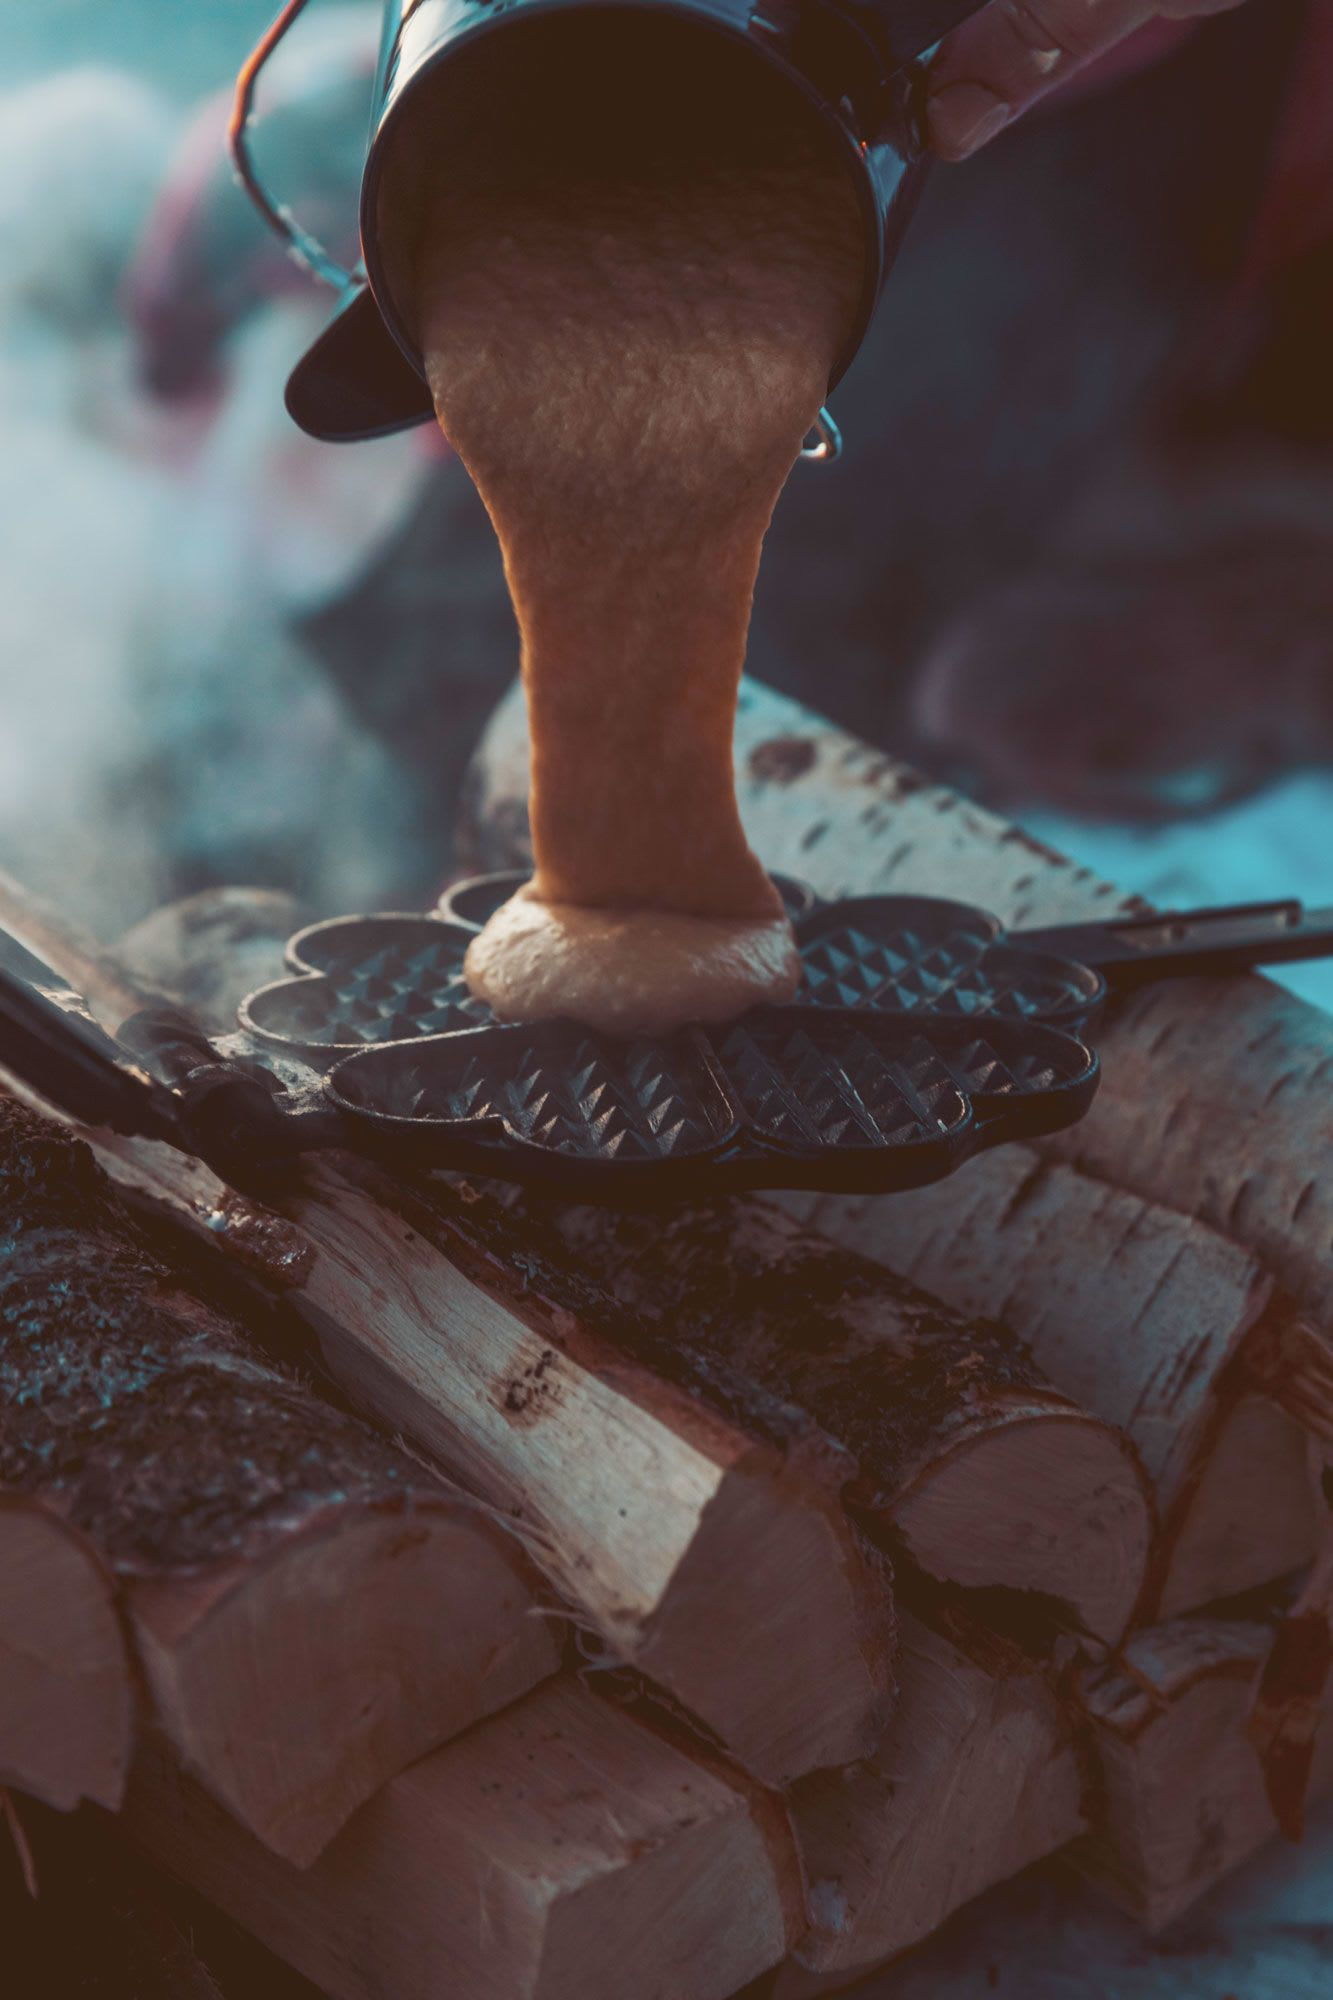 Grov vaffelrøre helles i vaffeljernet før det varmes over bålet.